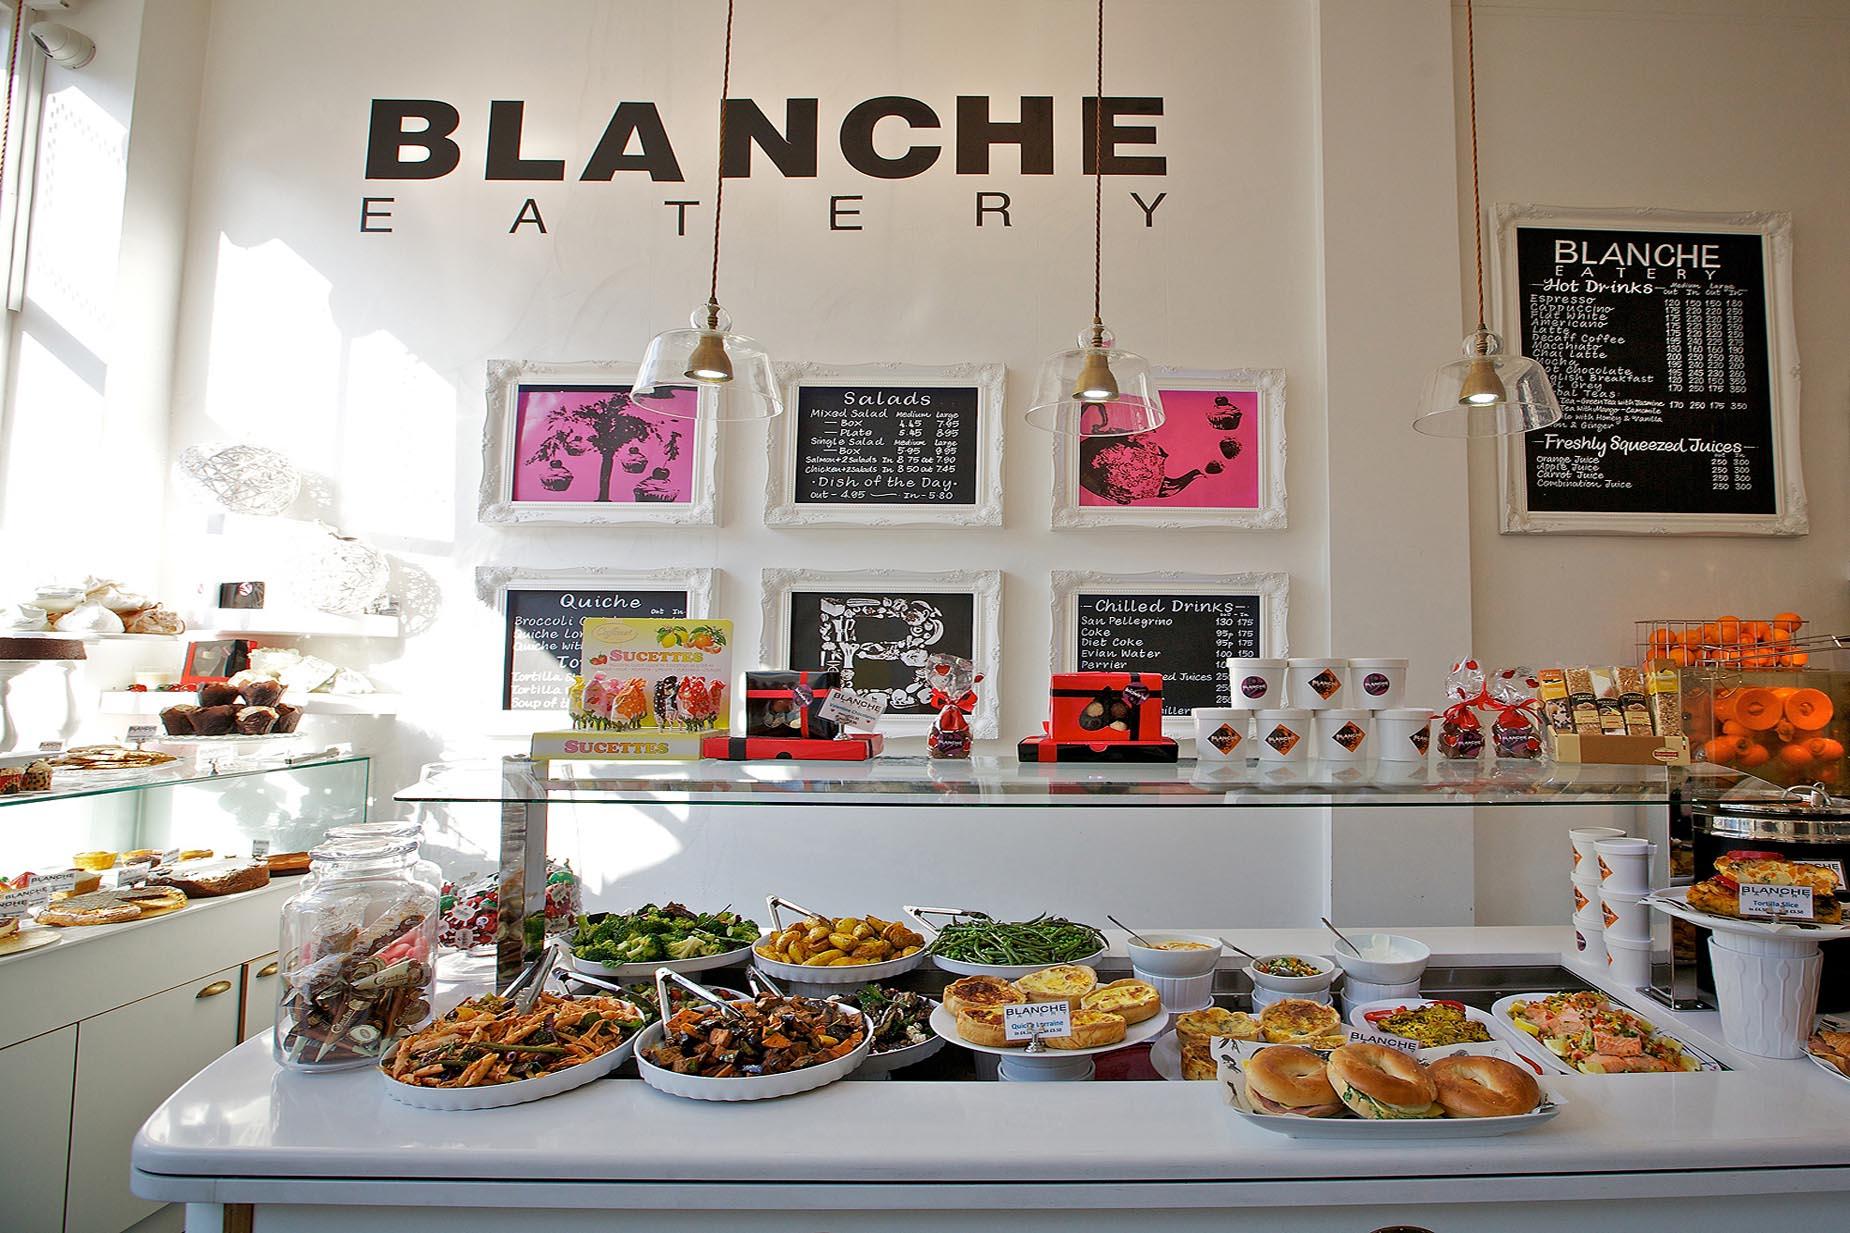 Blanche Eatery design.jpg